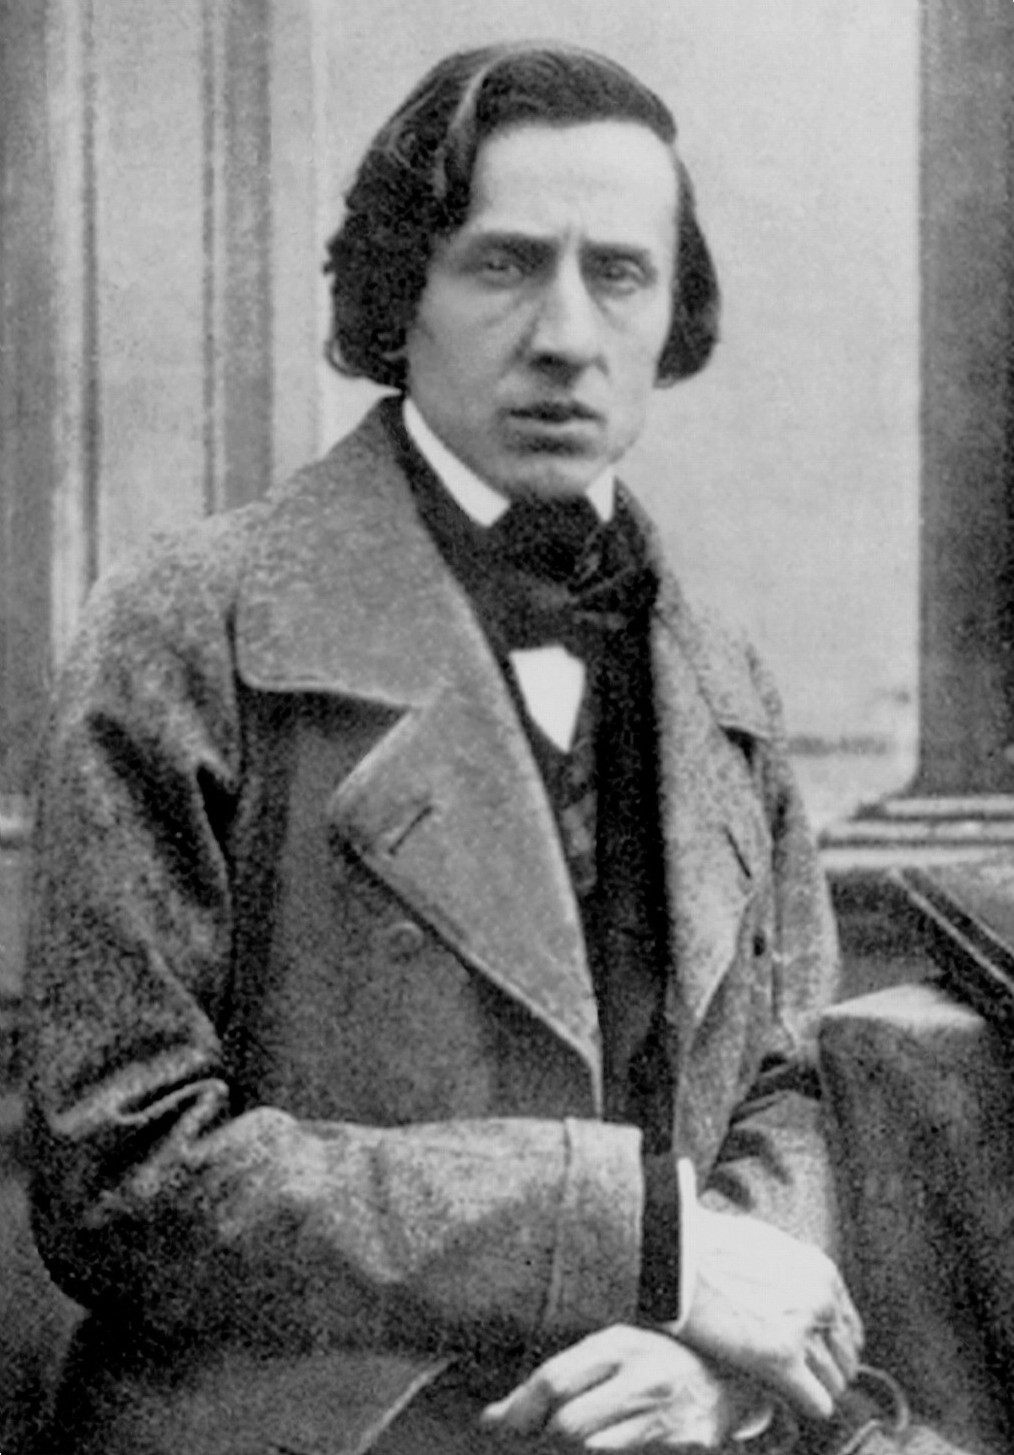 Baladas de Chopin interpretadas por Krystian Zimerman